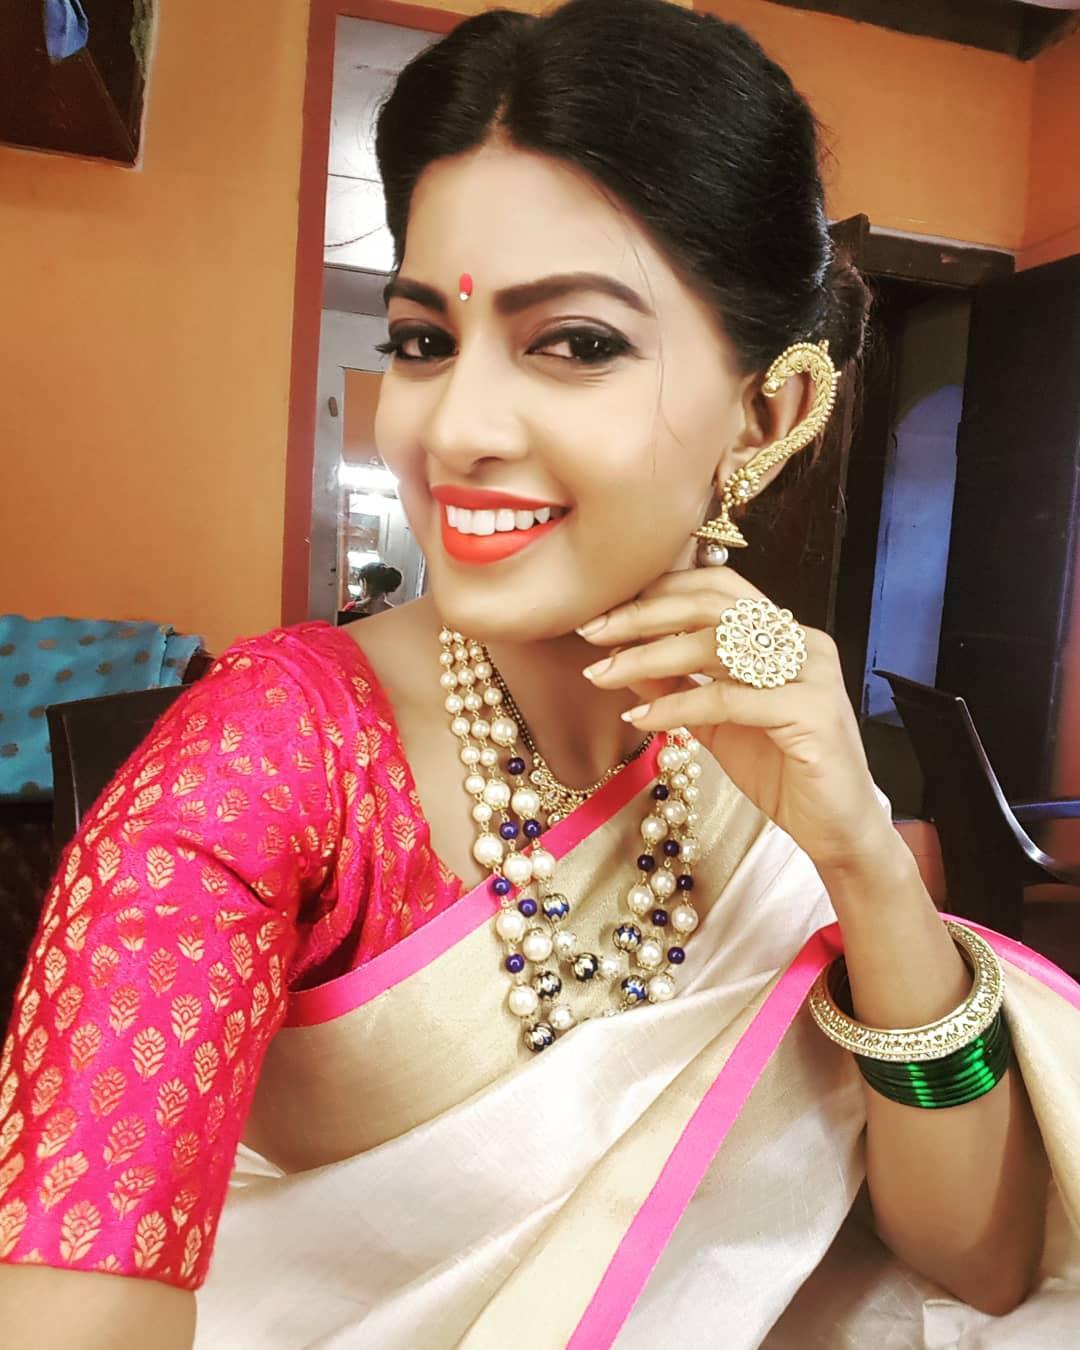 12 07 2019 1380 dhanashri kadgaonkar marathi actress (32)